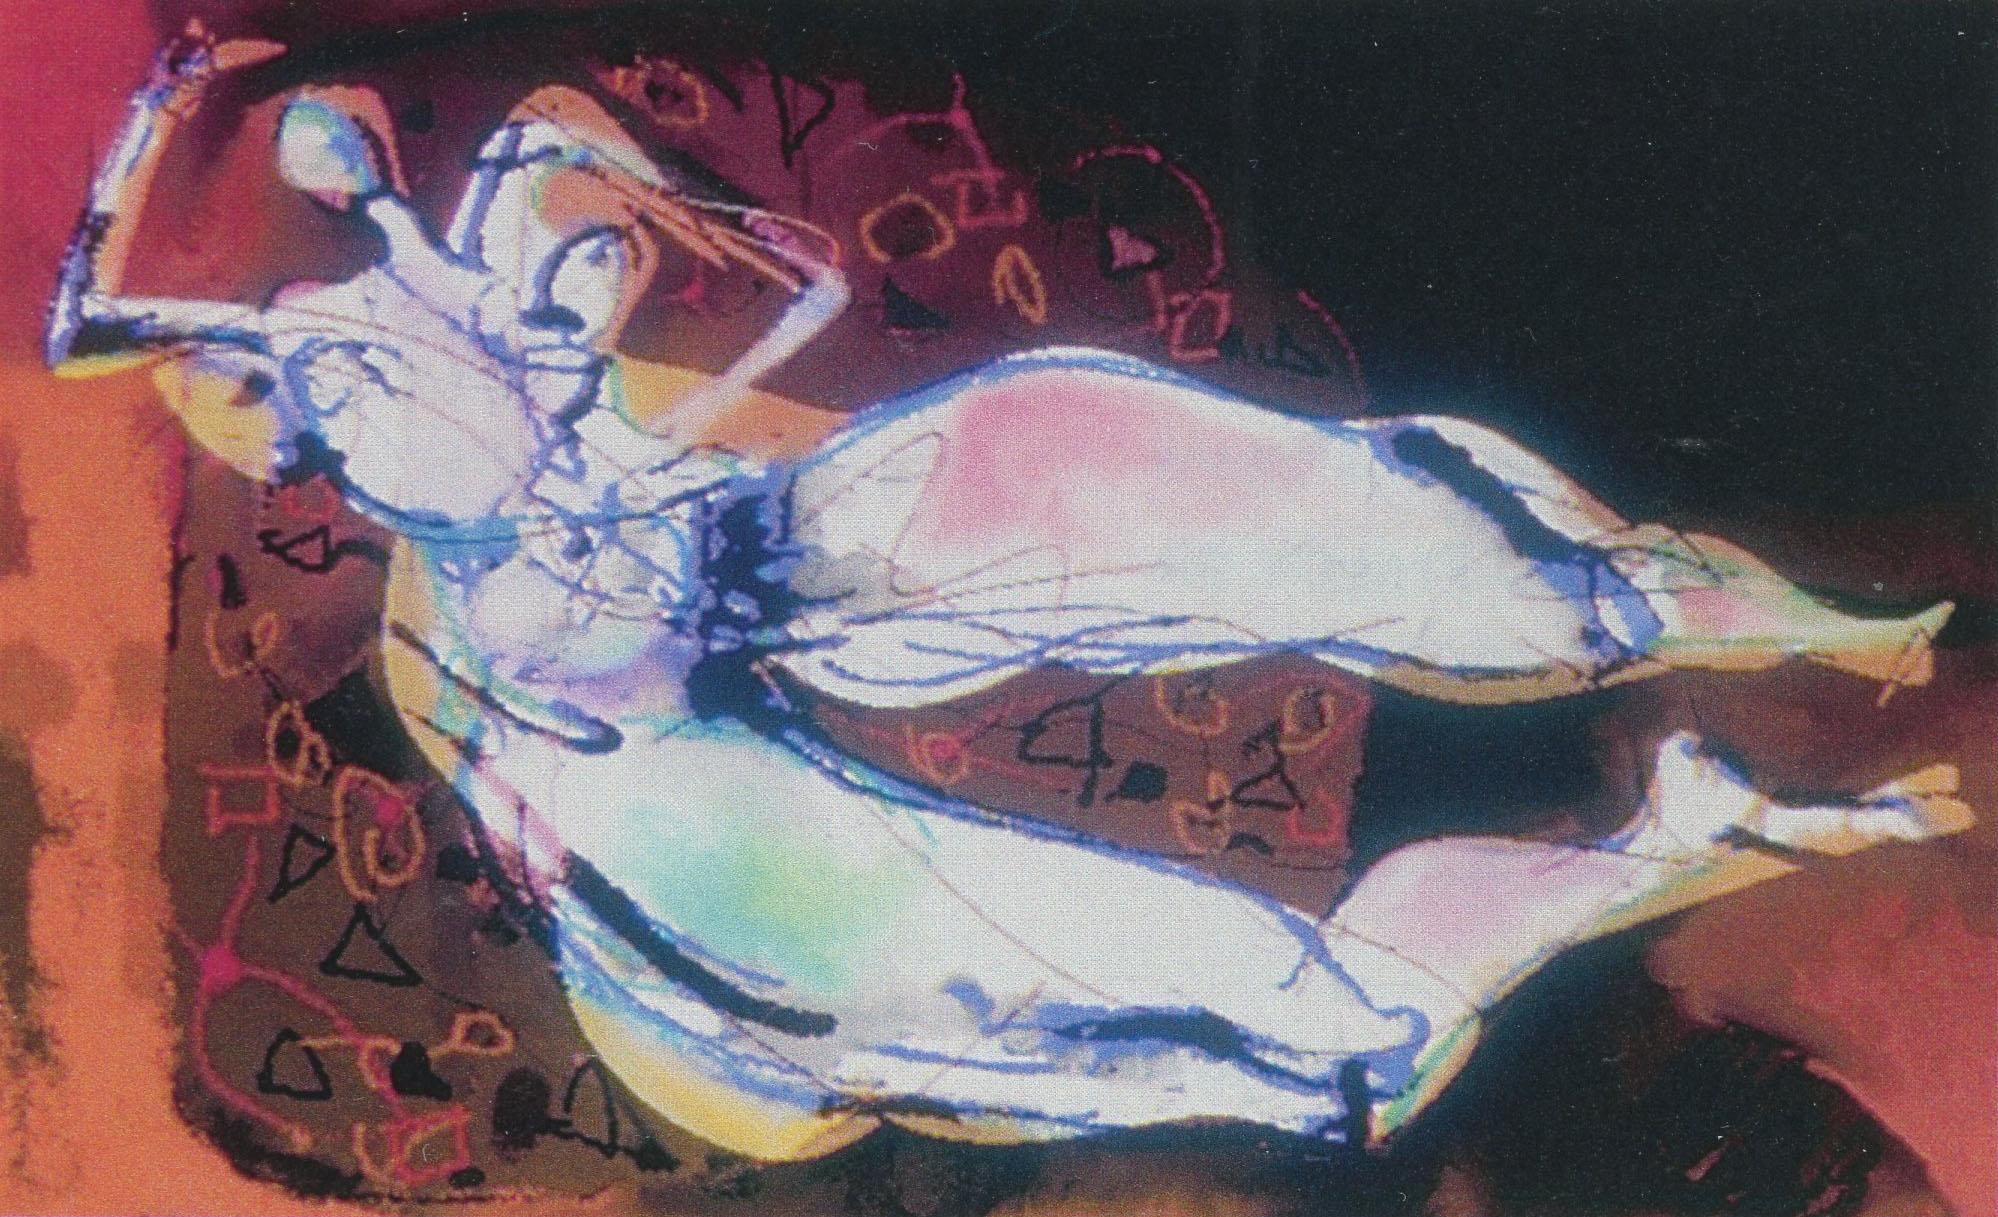 ©1994, Toshihiro Anzai